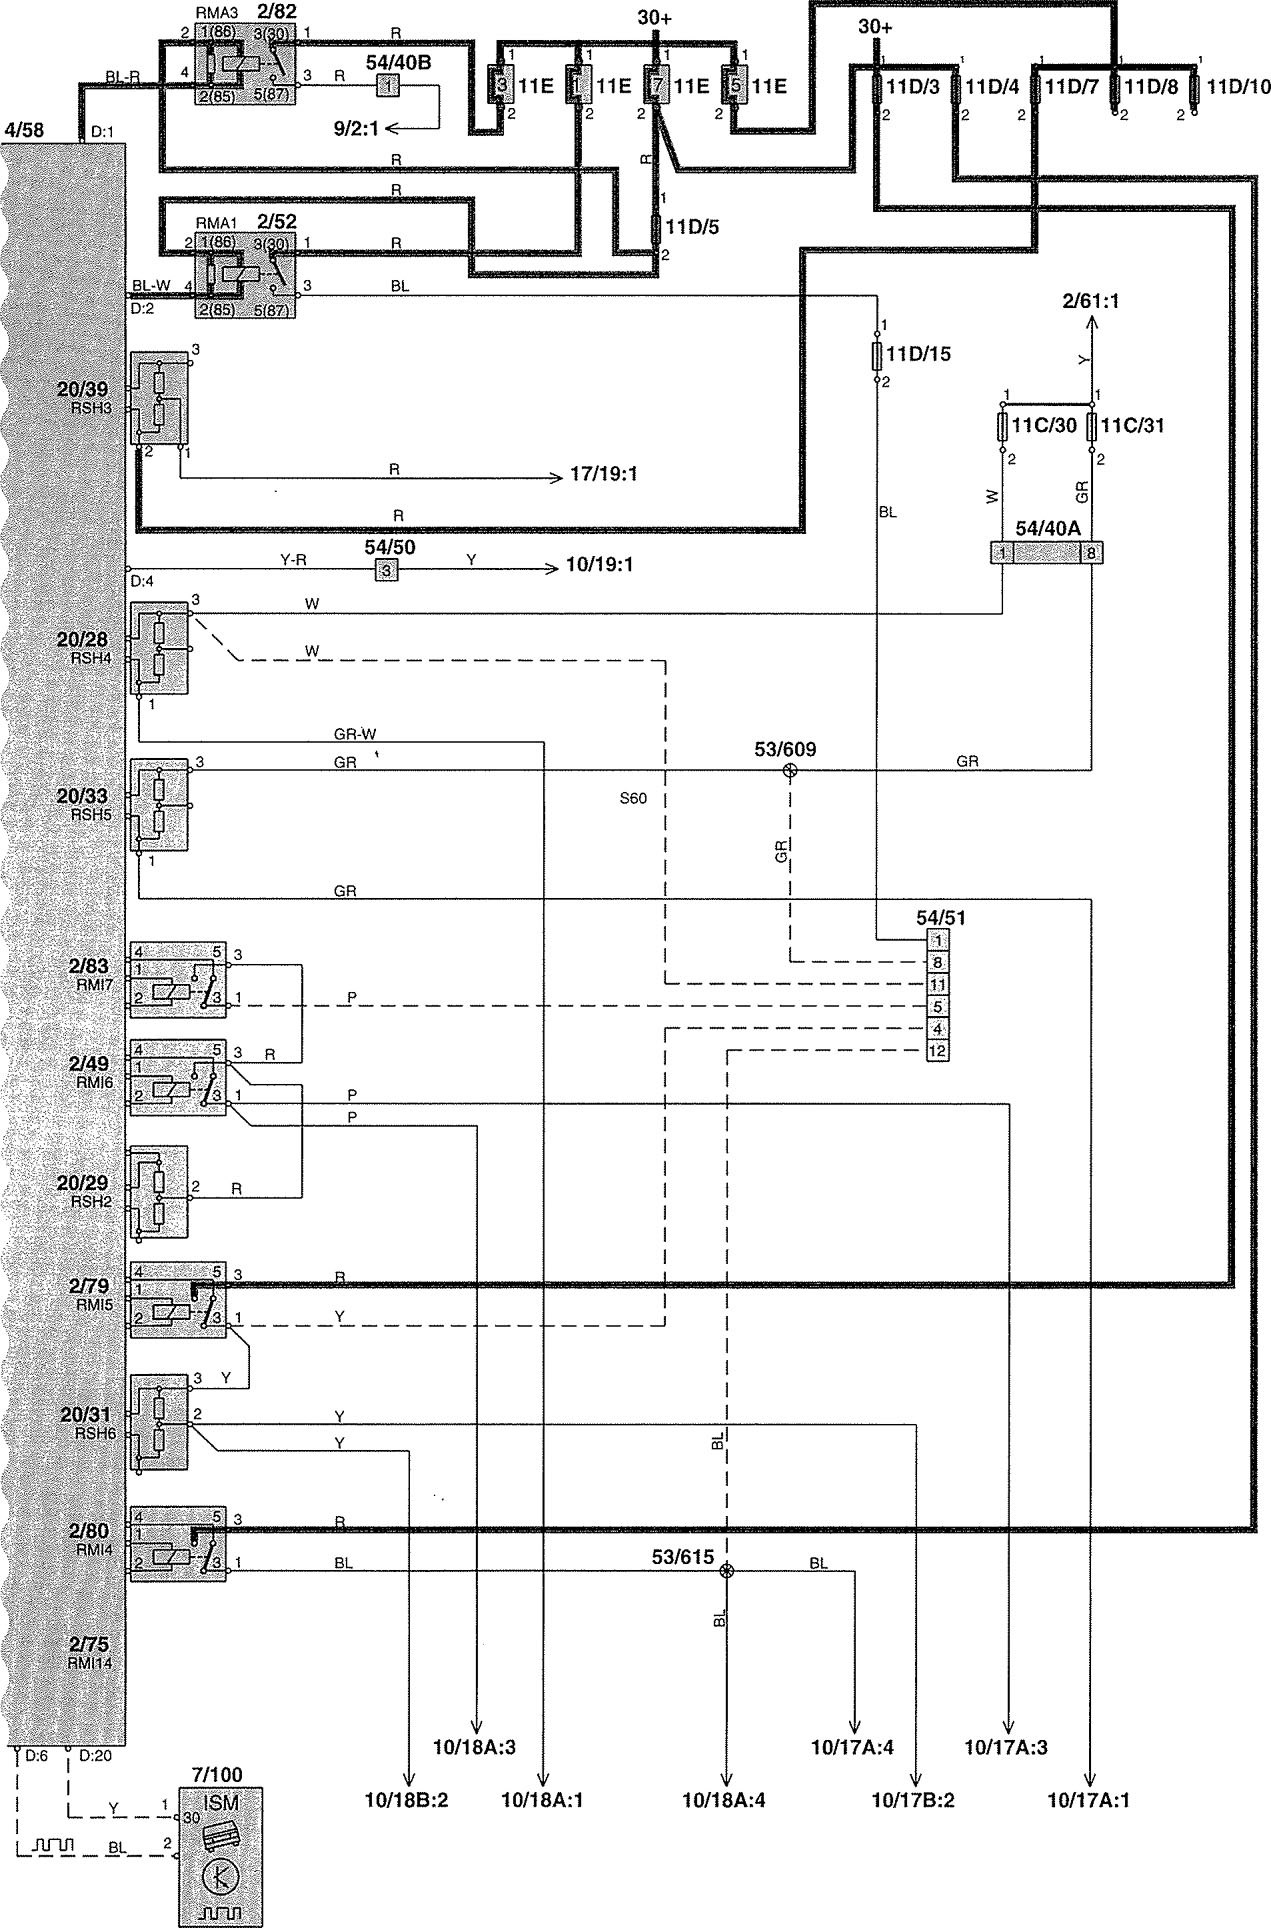 Cool 2010 Volvo Xc60 Wiring Diagram Wiring Diagram Wiring Digital Resources Antuskbiperorg